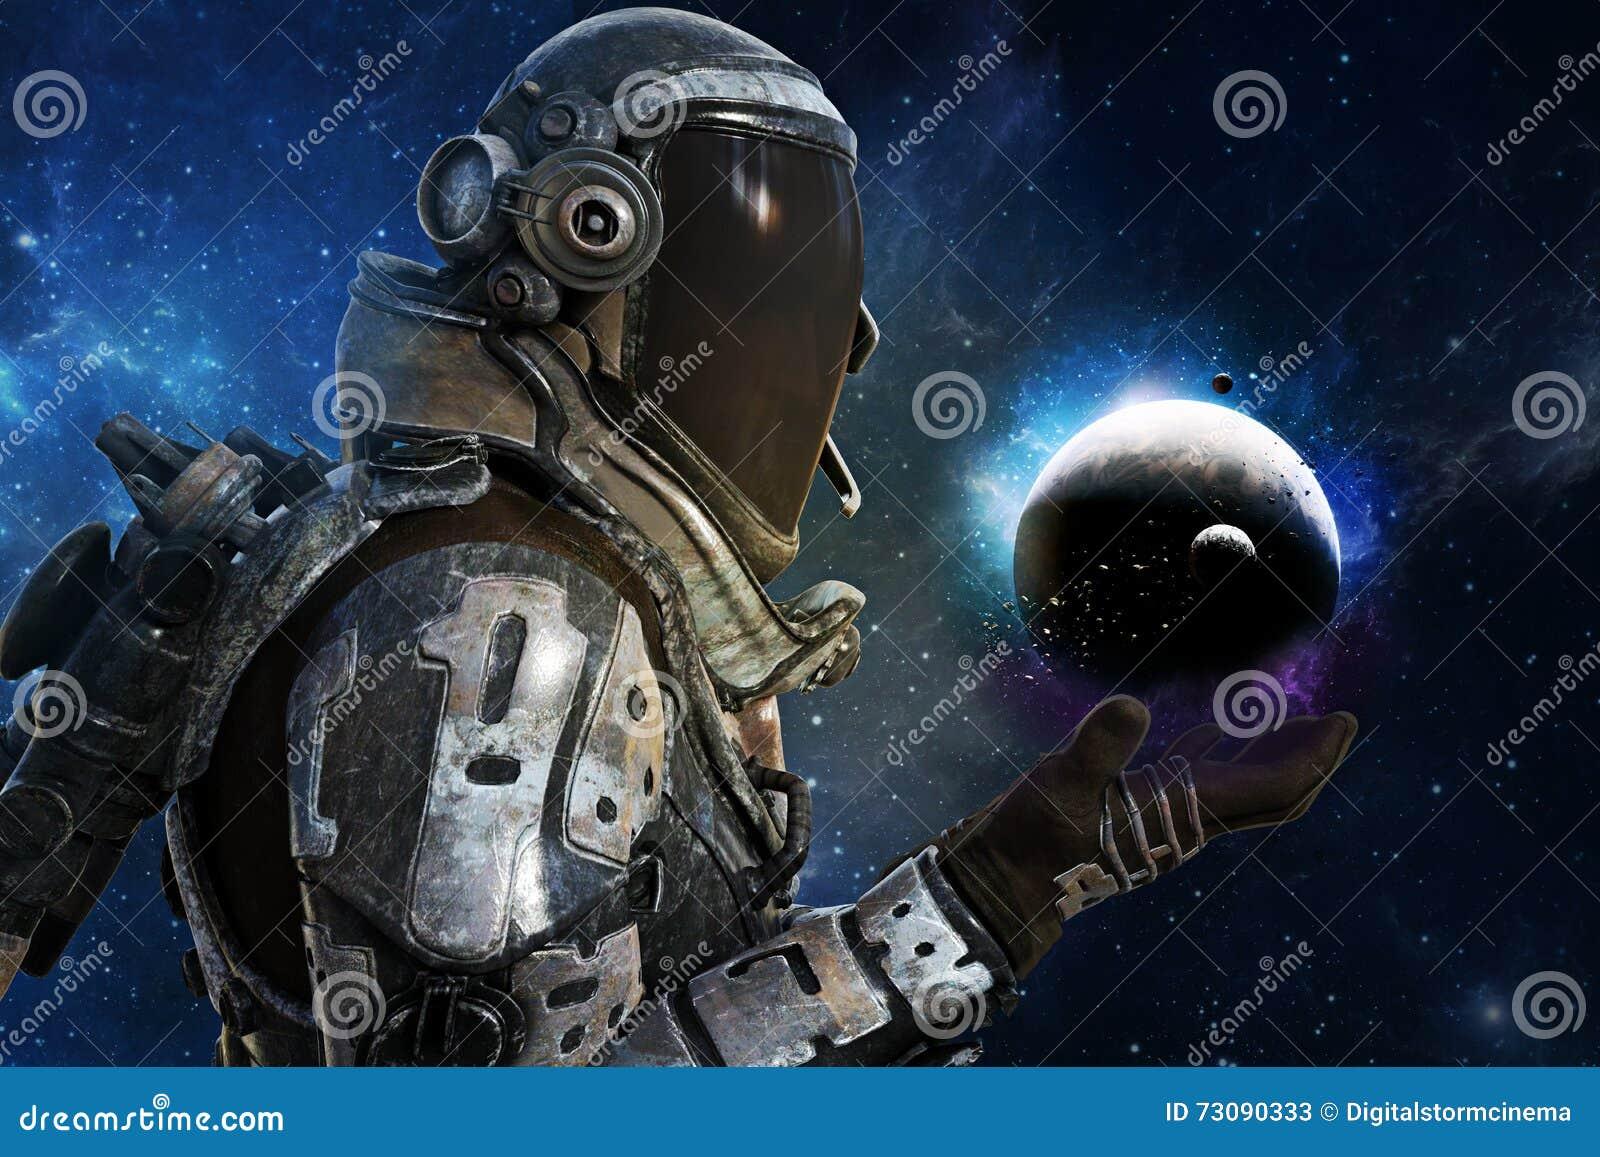 Exploration, A futuristic astronauts of the galaxy concept